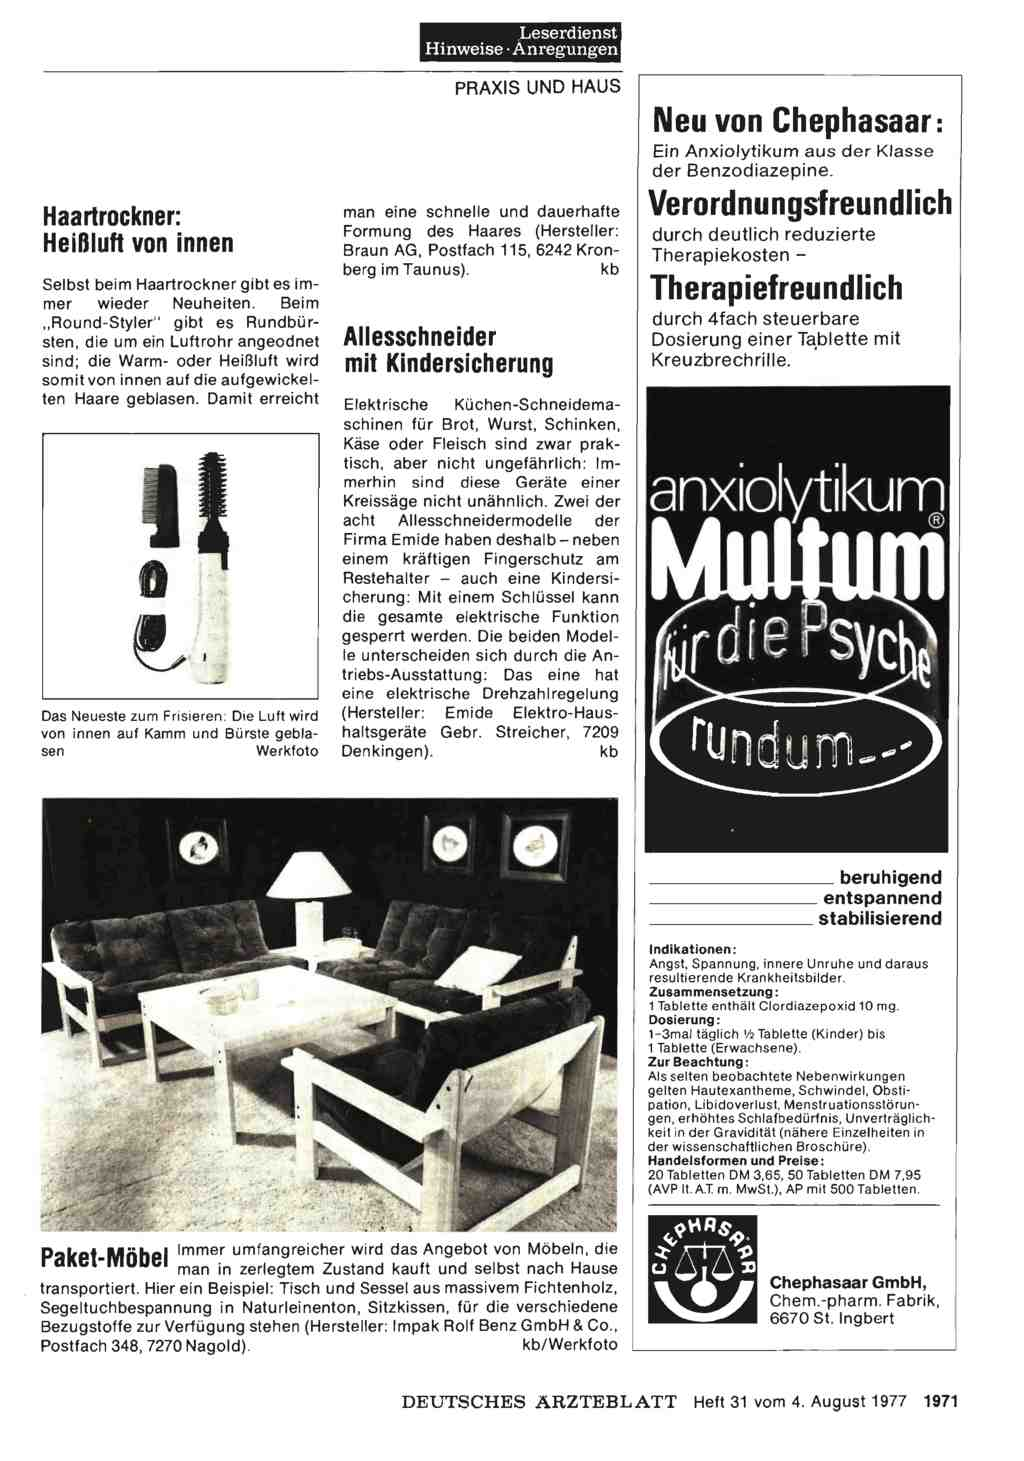 High Quality Deutsches Ärzteblatt